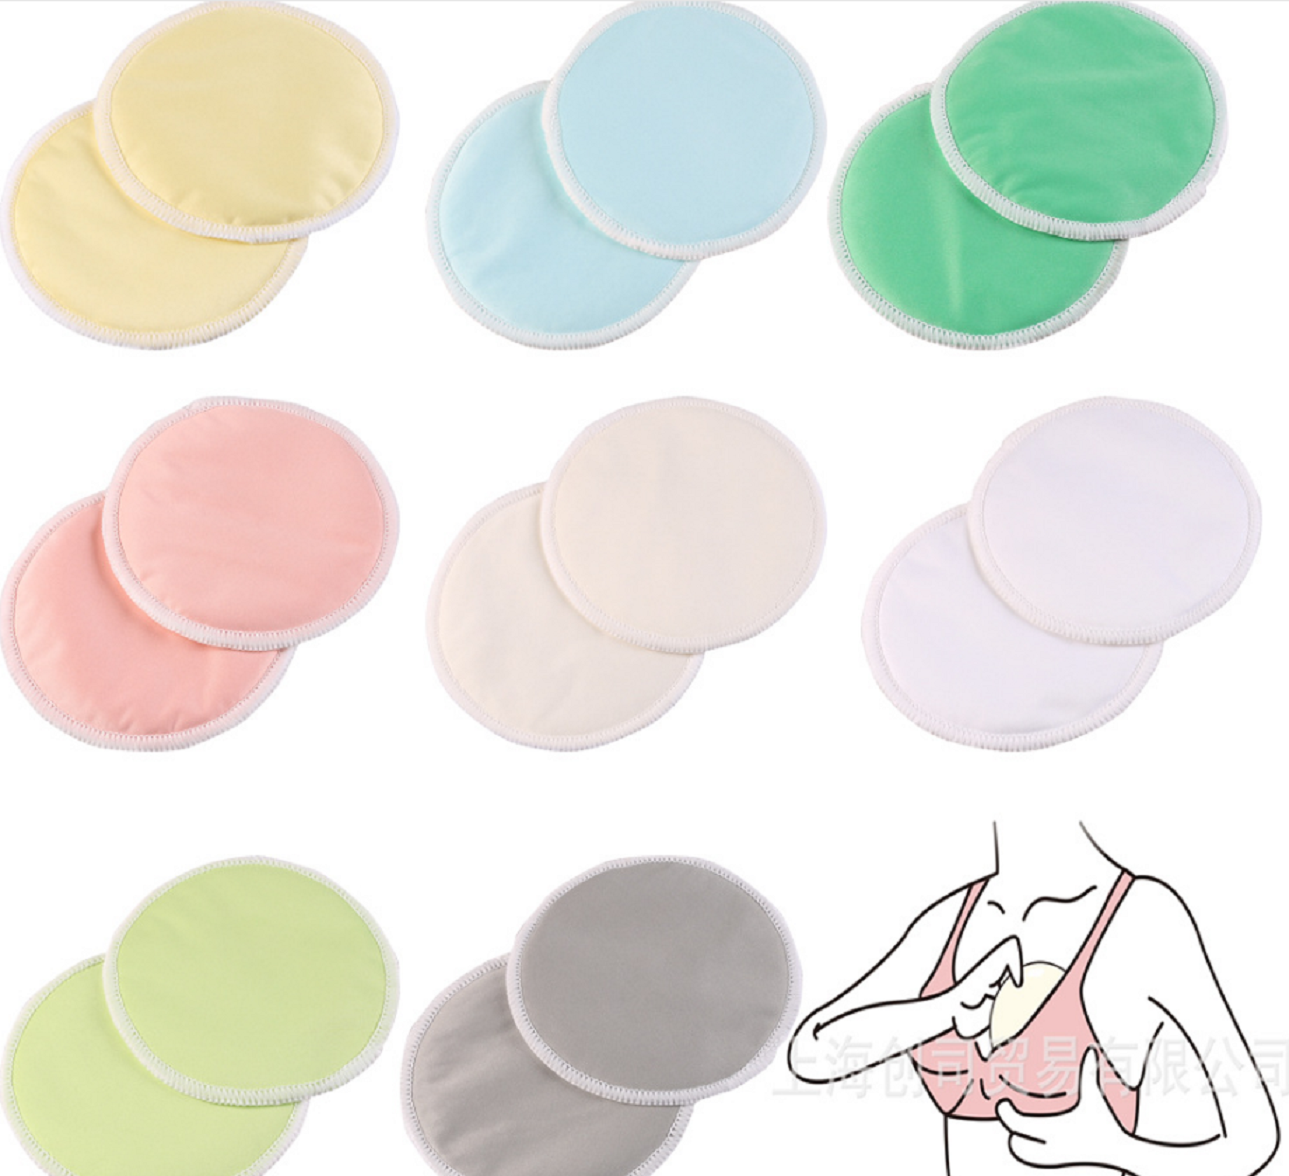 8Pcs Bamboo Reusable Breast Nursing Breastfeeding Washable Soft Organic Pads 9